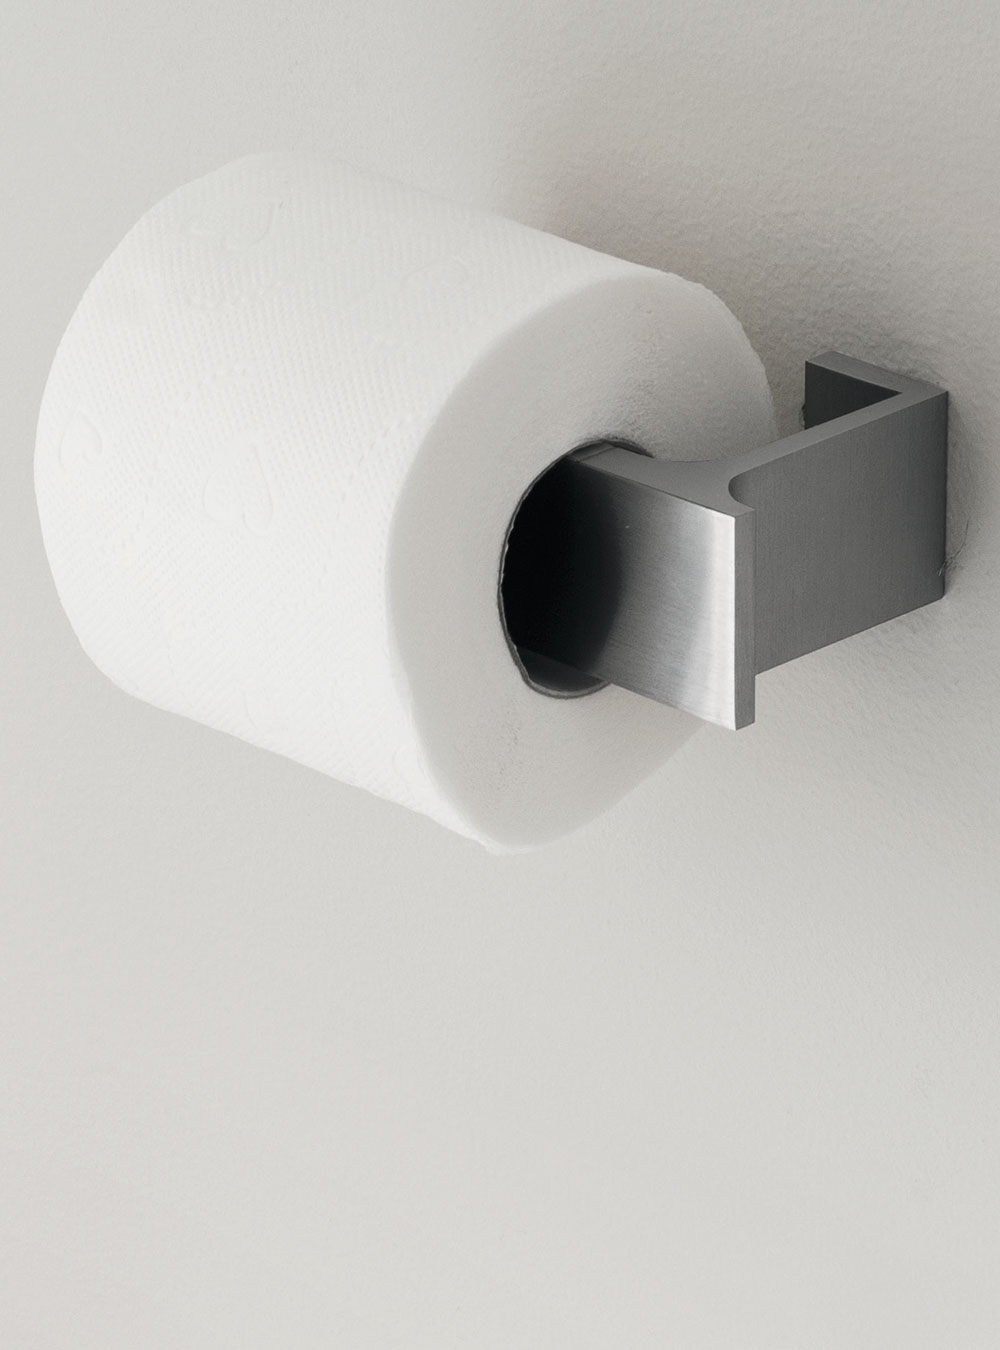 https://www.arbiarredobagno.com/wp-content/uploads/2021/05/Arbi-Zeus-porta-rotolo-inox-spazzolato-.jpg